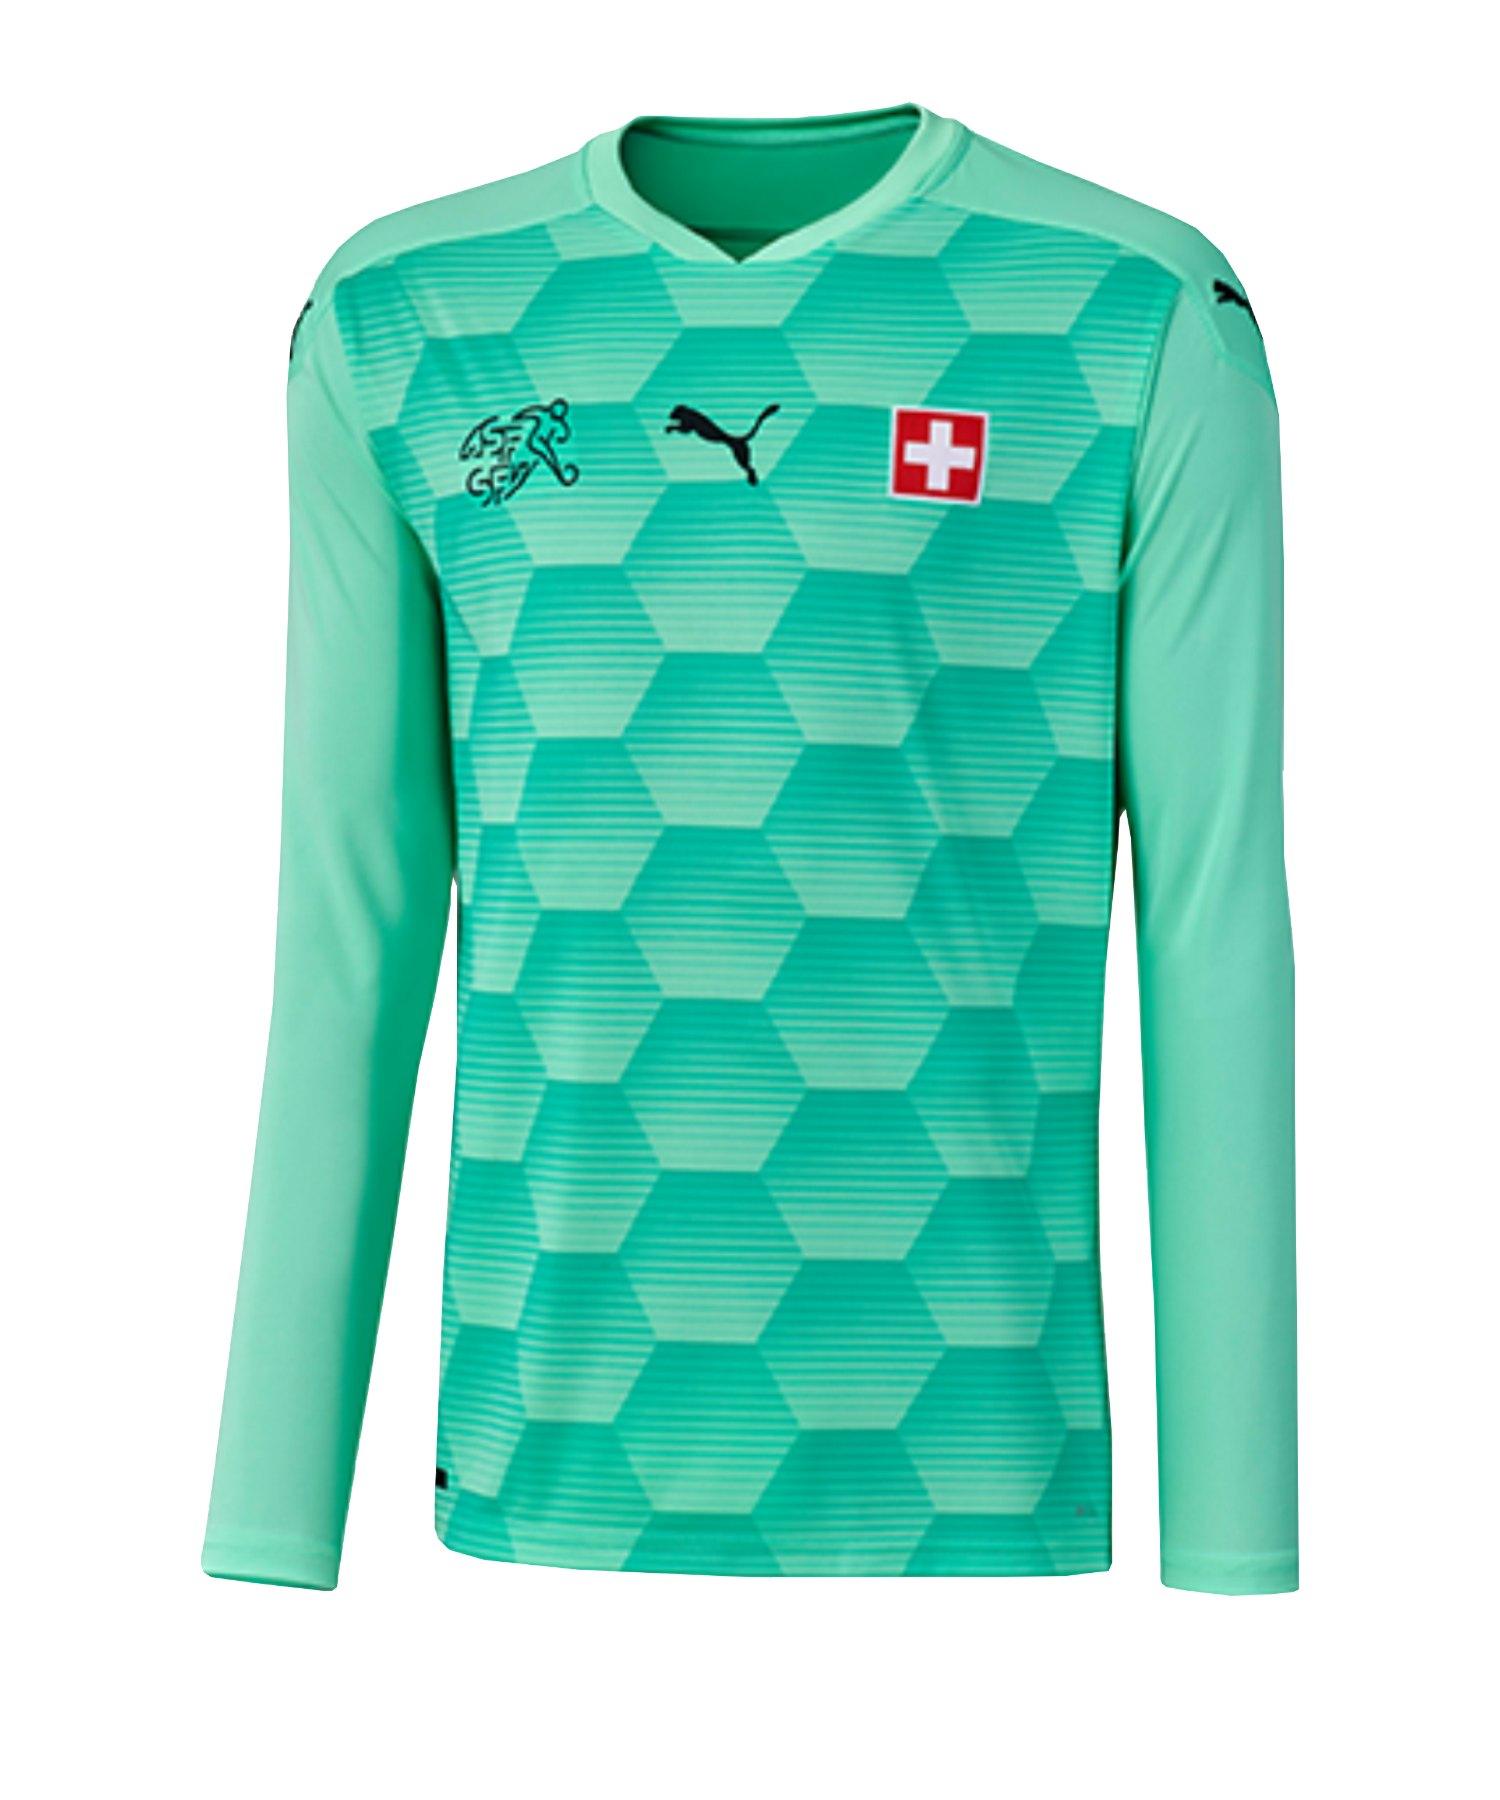 PUMA Schweiz Torwarttrikot EM 2020 Grün F04 - grün